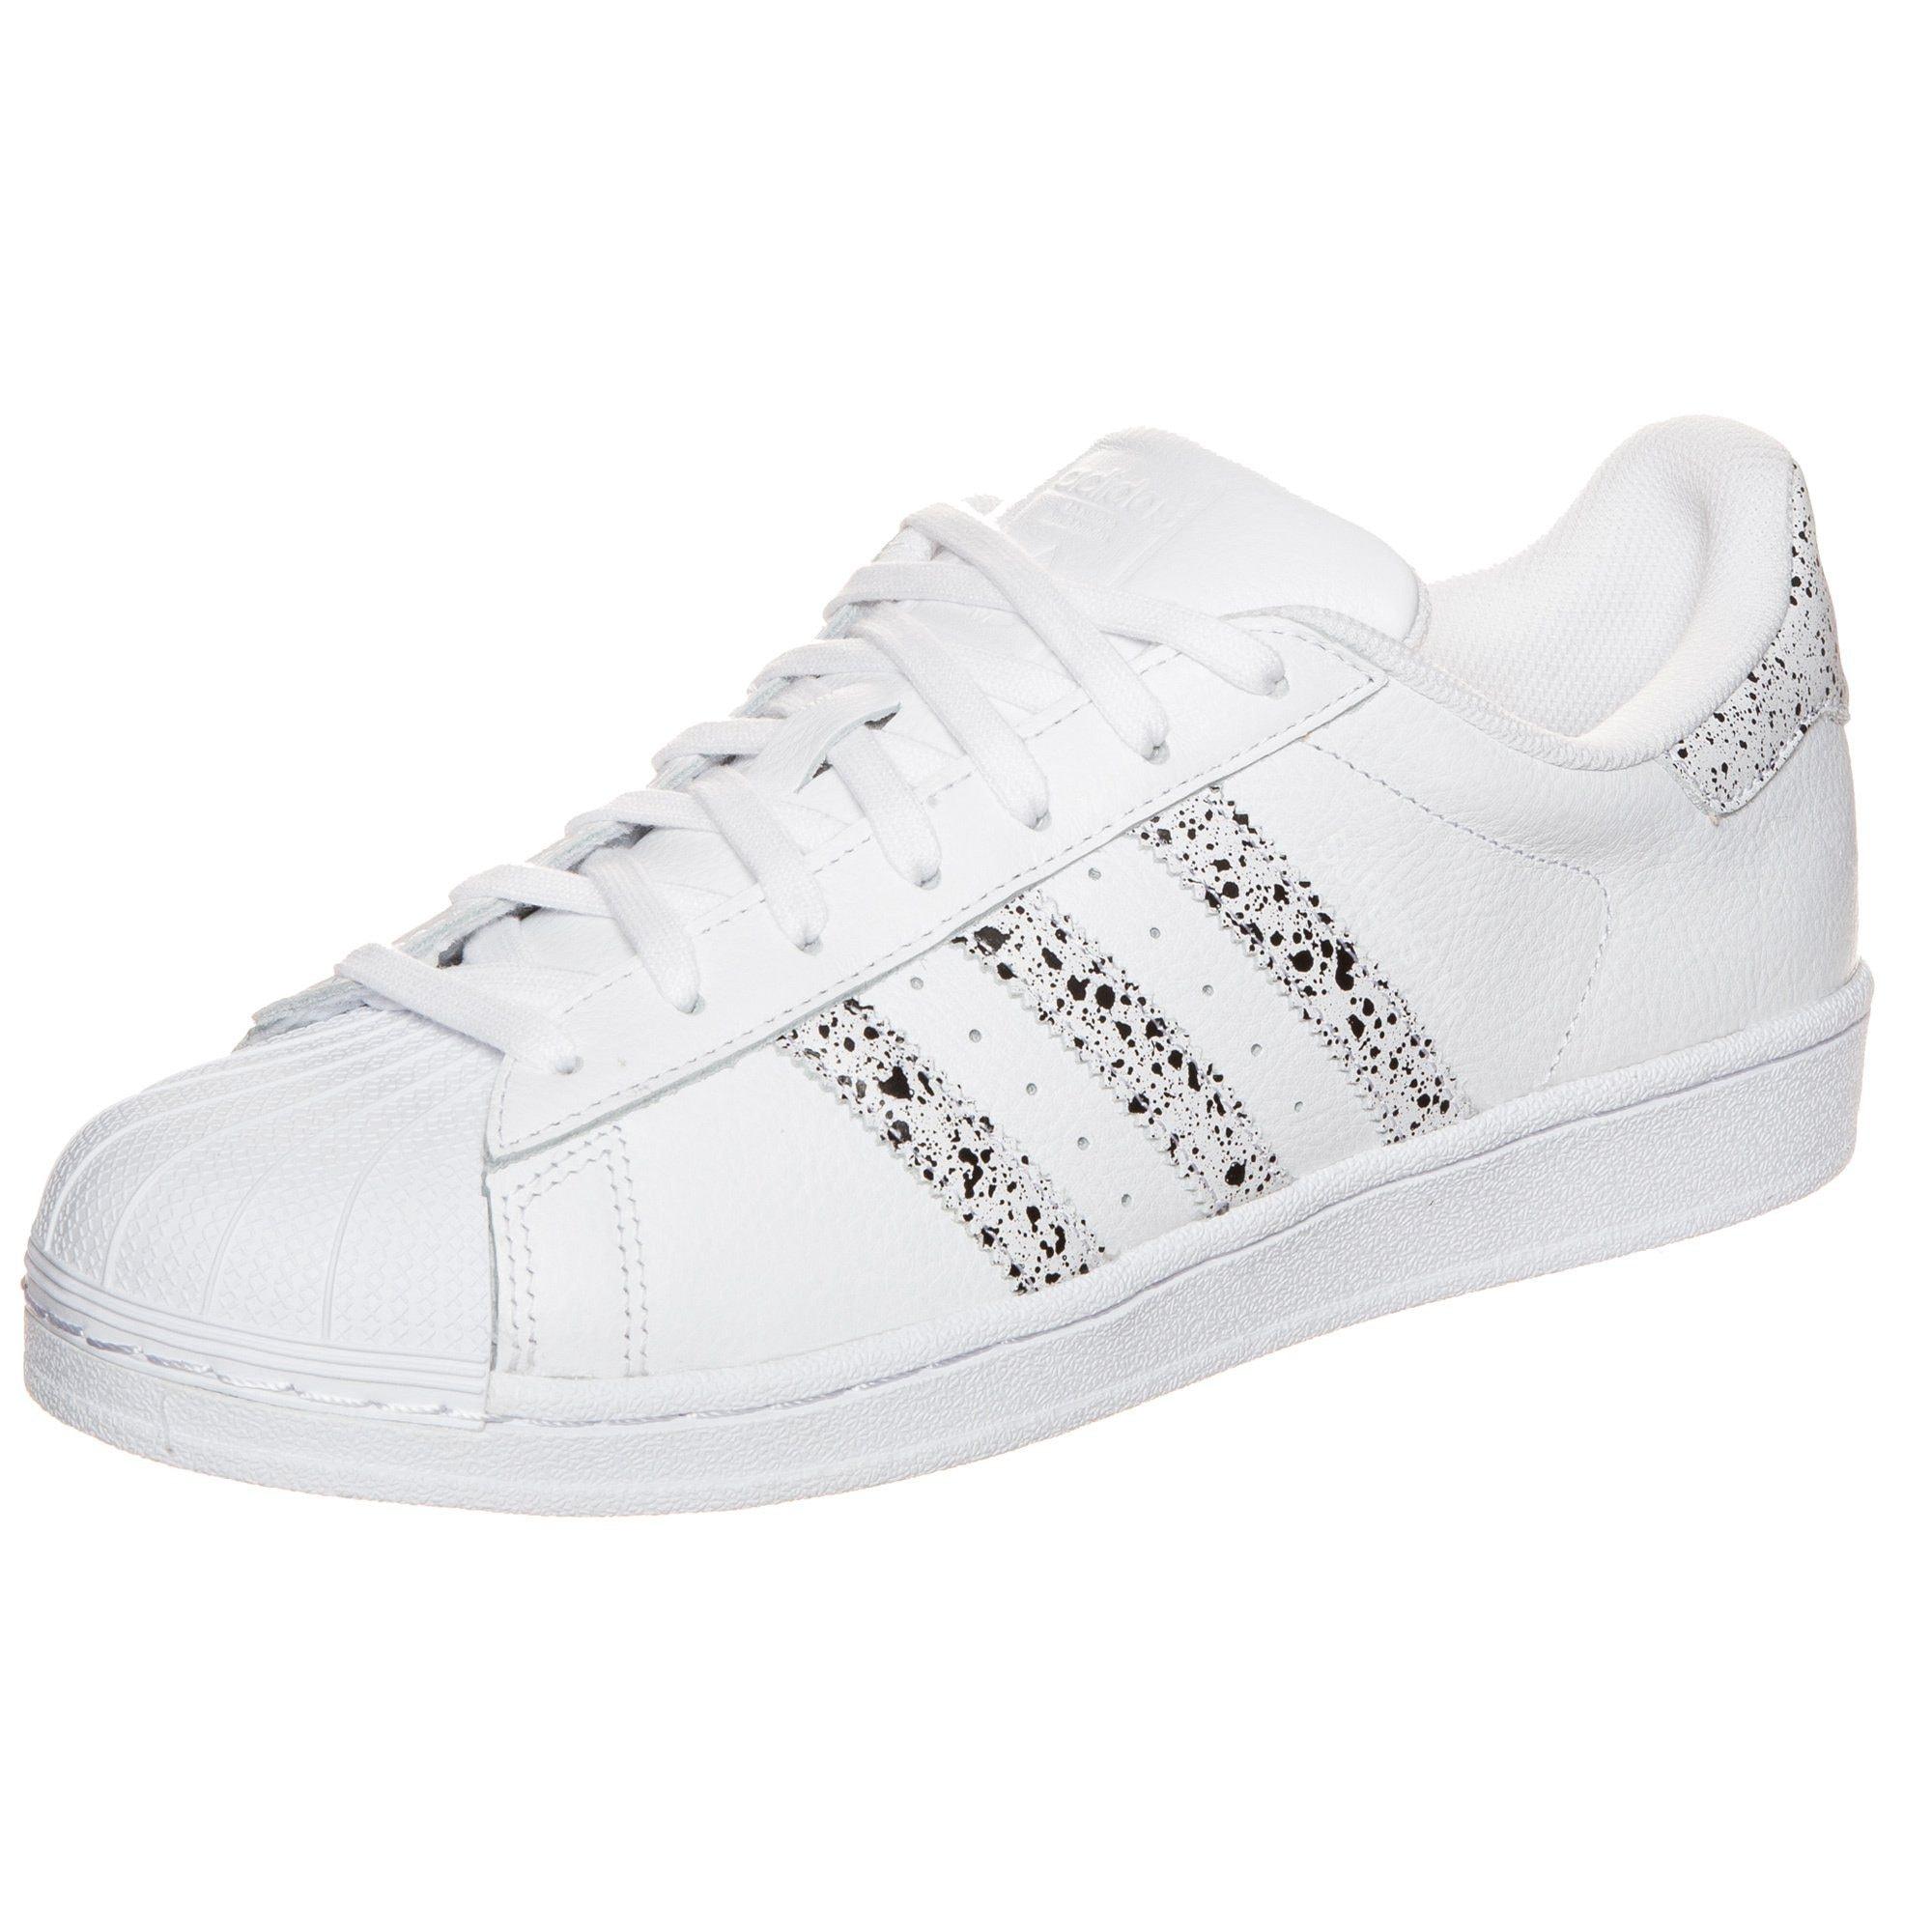 Superstar Sneaker Adidas Baur Originals Per Rechnung XiuZOPkT